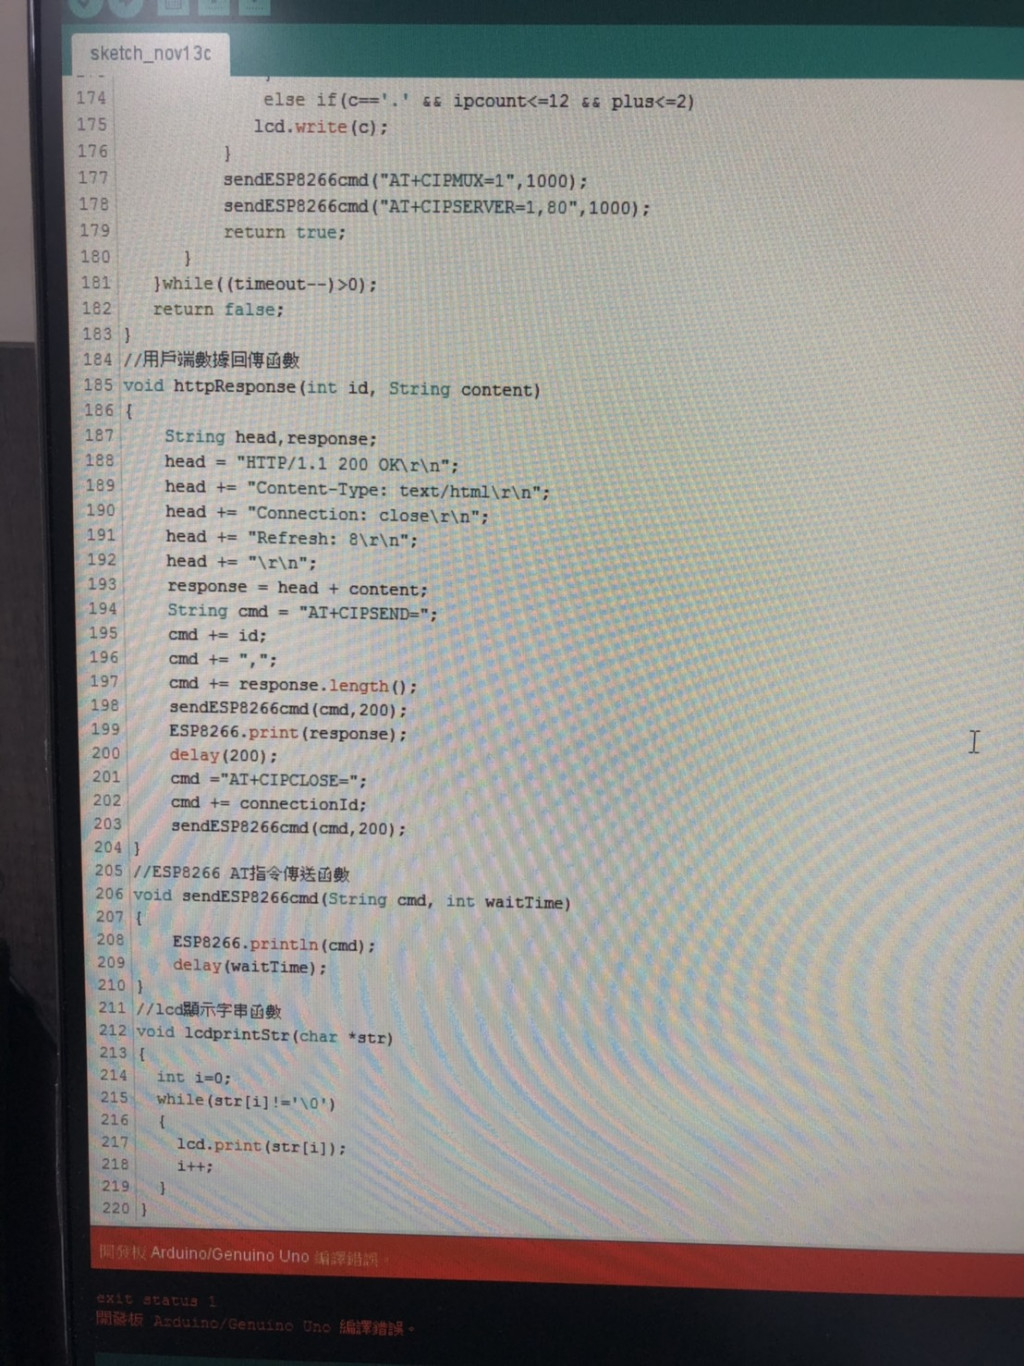 https://ithelp.ithome.com.tw/upload/images/20191201/20123269406X4c7qRM.jpg